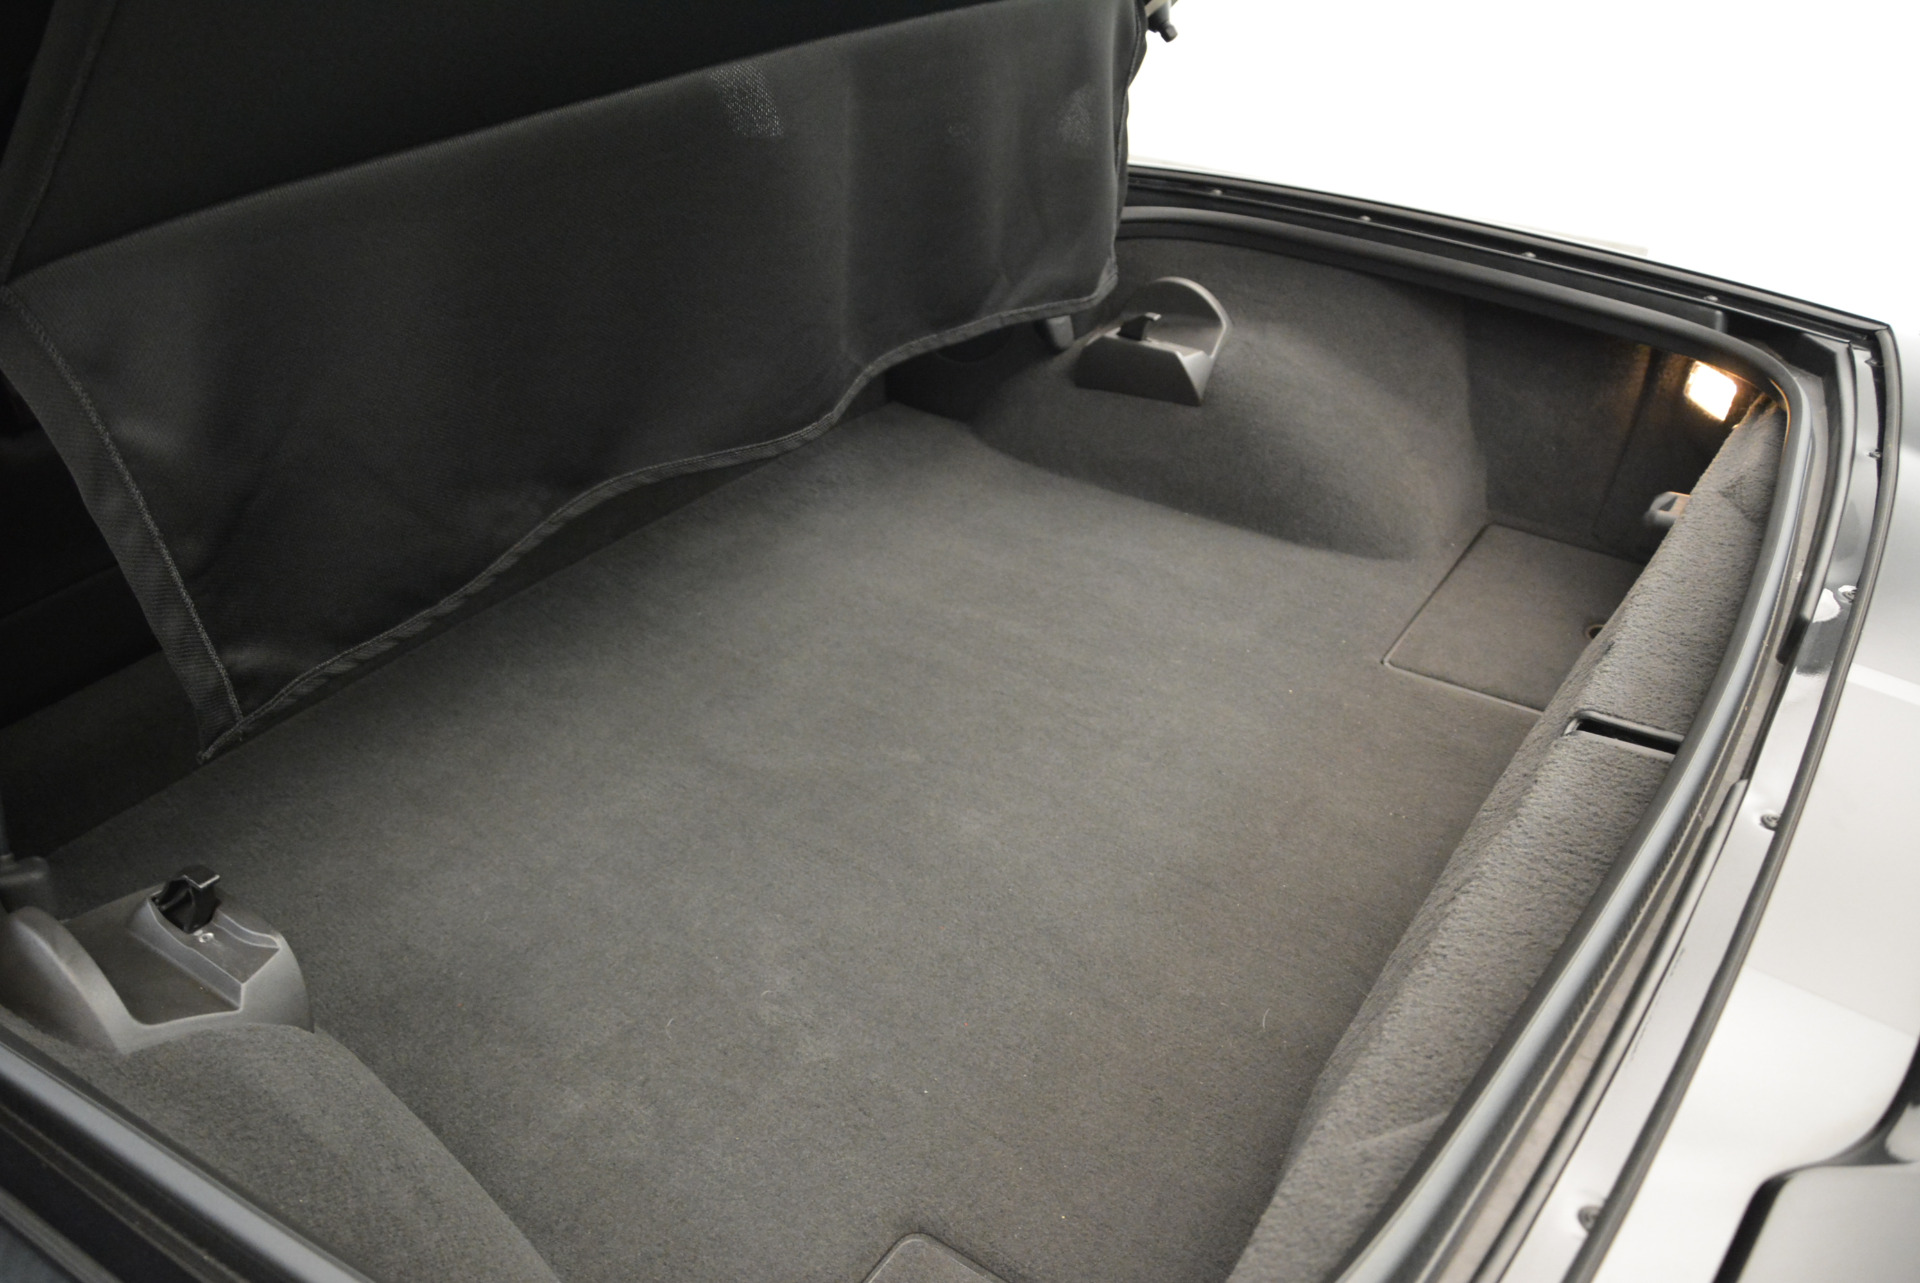 Used 2012 Chevrolet Corvette Z16 Grand Sport For Sale In Greenwich, CT 1952_p24